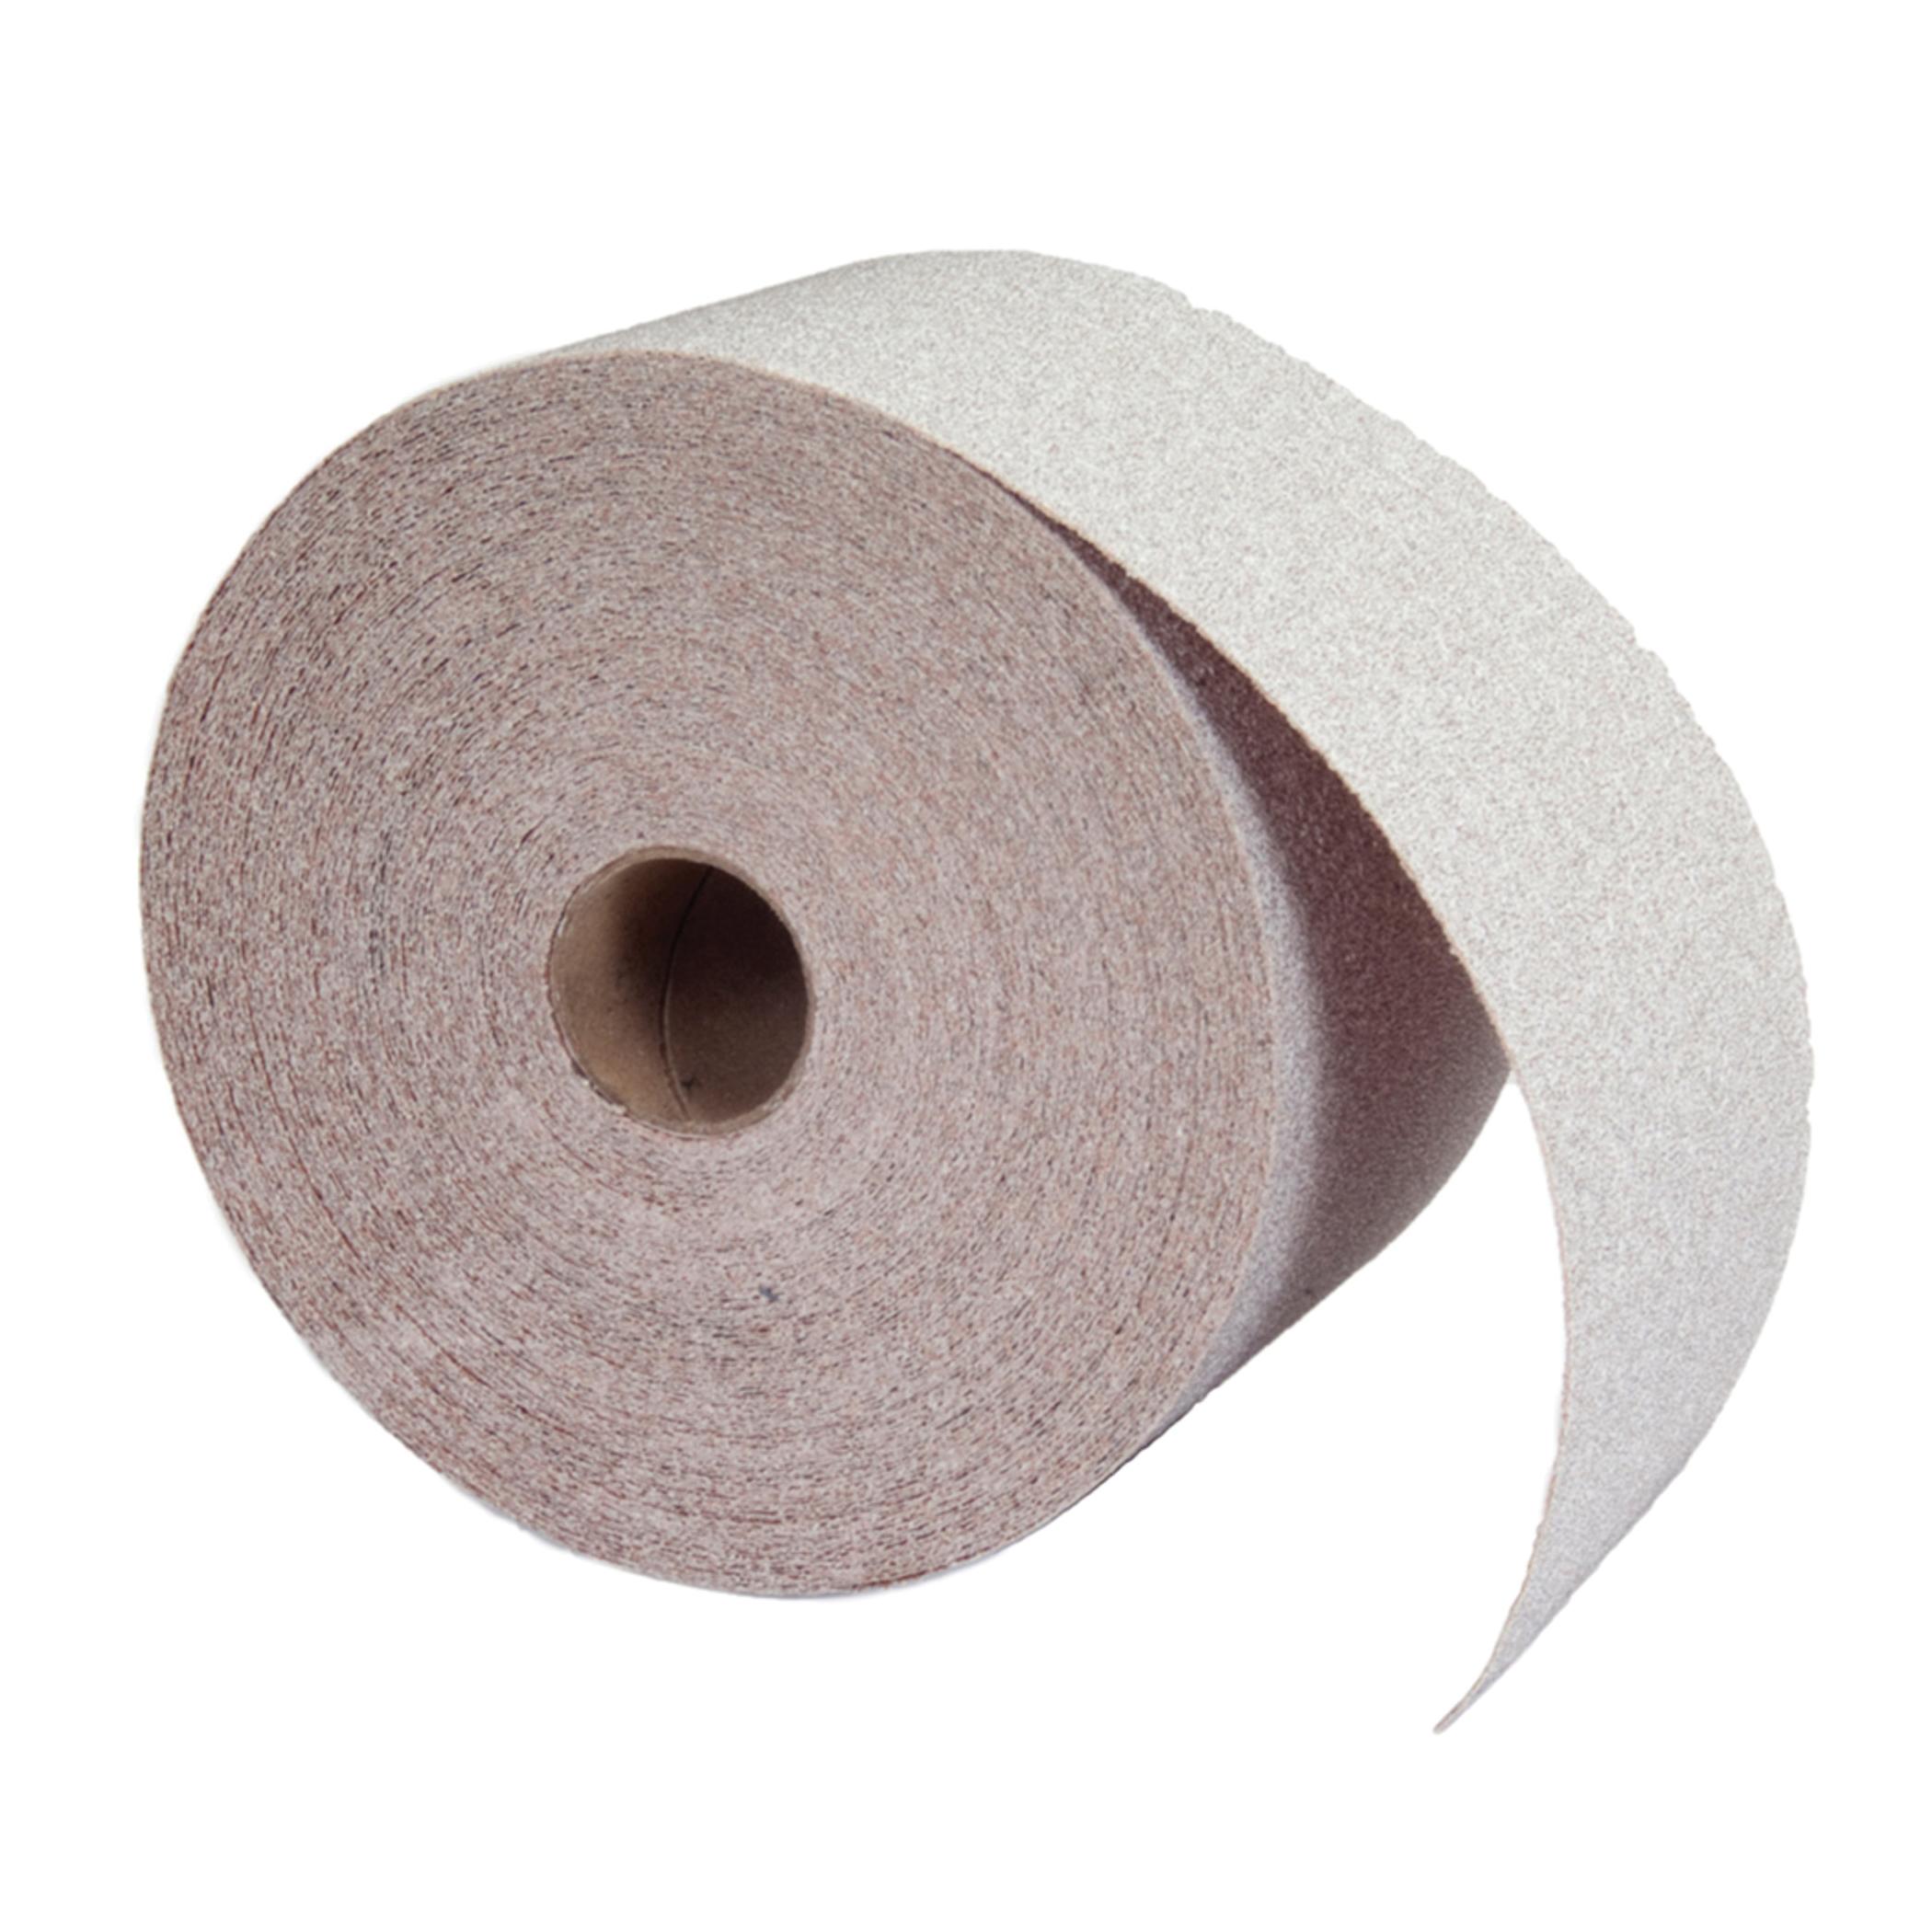 Norton® 66261131694 OP A275 Coated Abrasive Roll, 10 yd L x 4-1/2 in W, 150 Grit, Fine Grade, Aluminum Oxide Abrasive, Anti-Loading Paper Backing